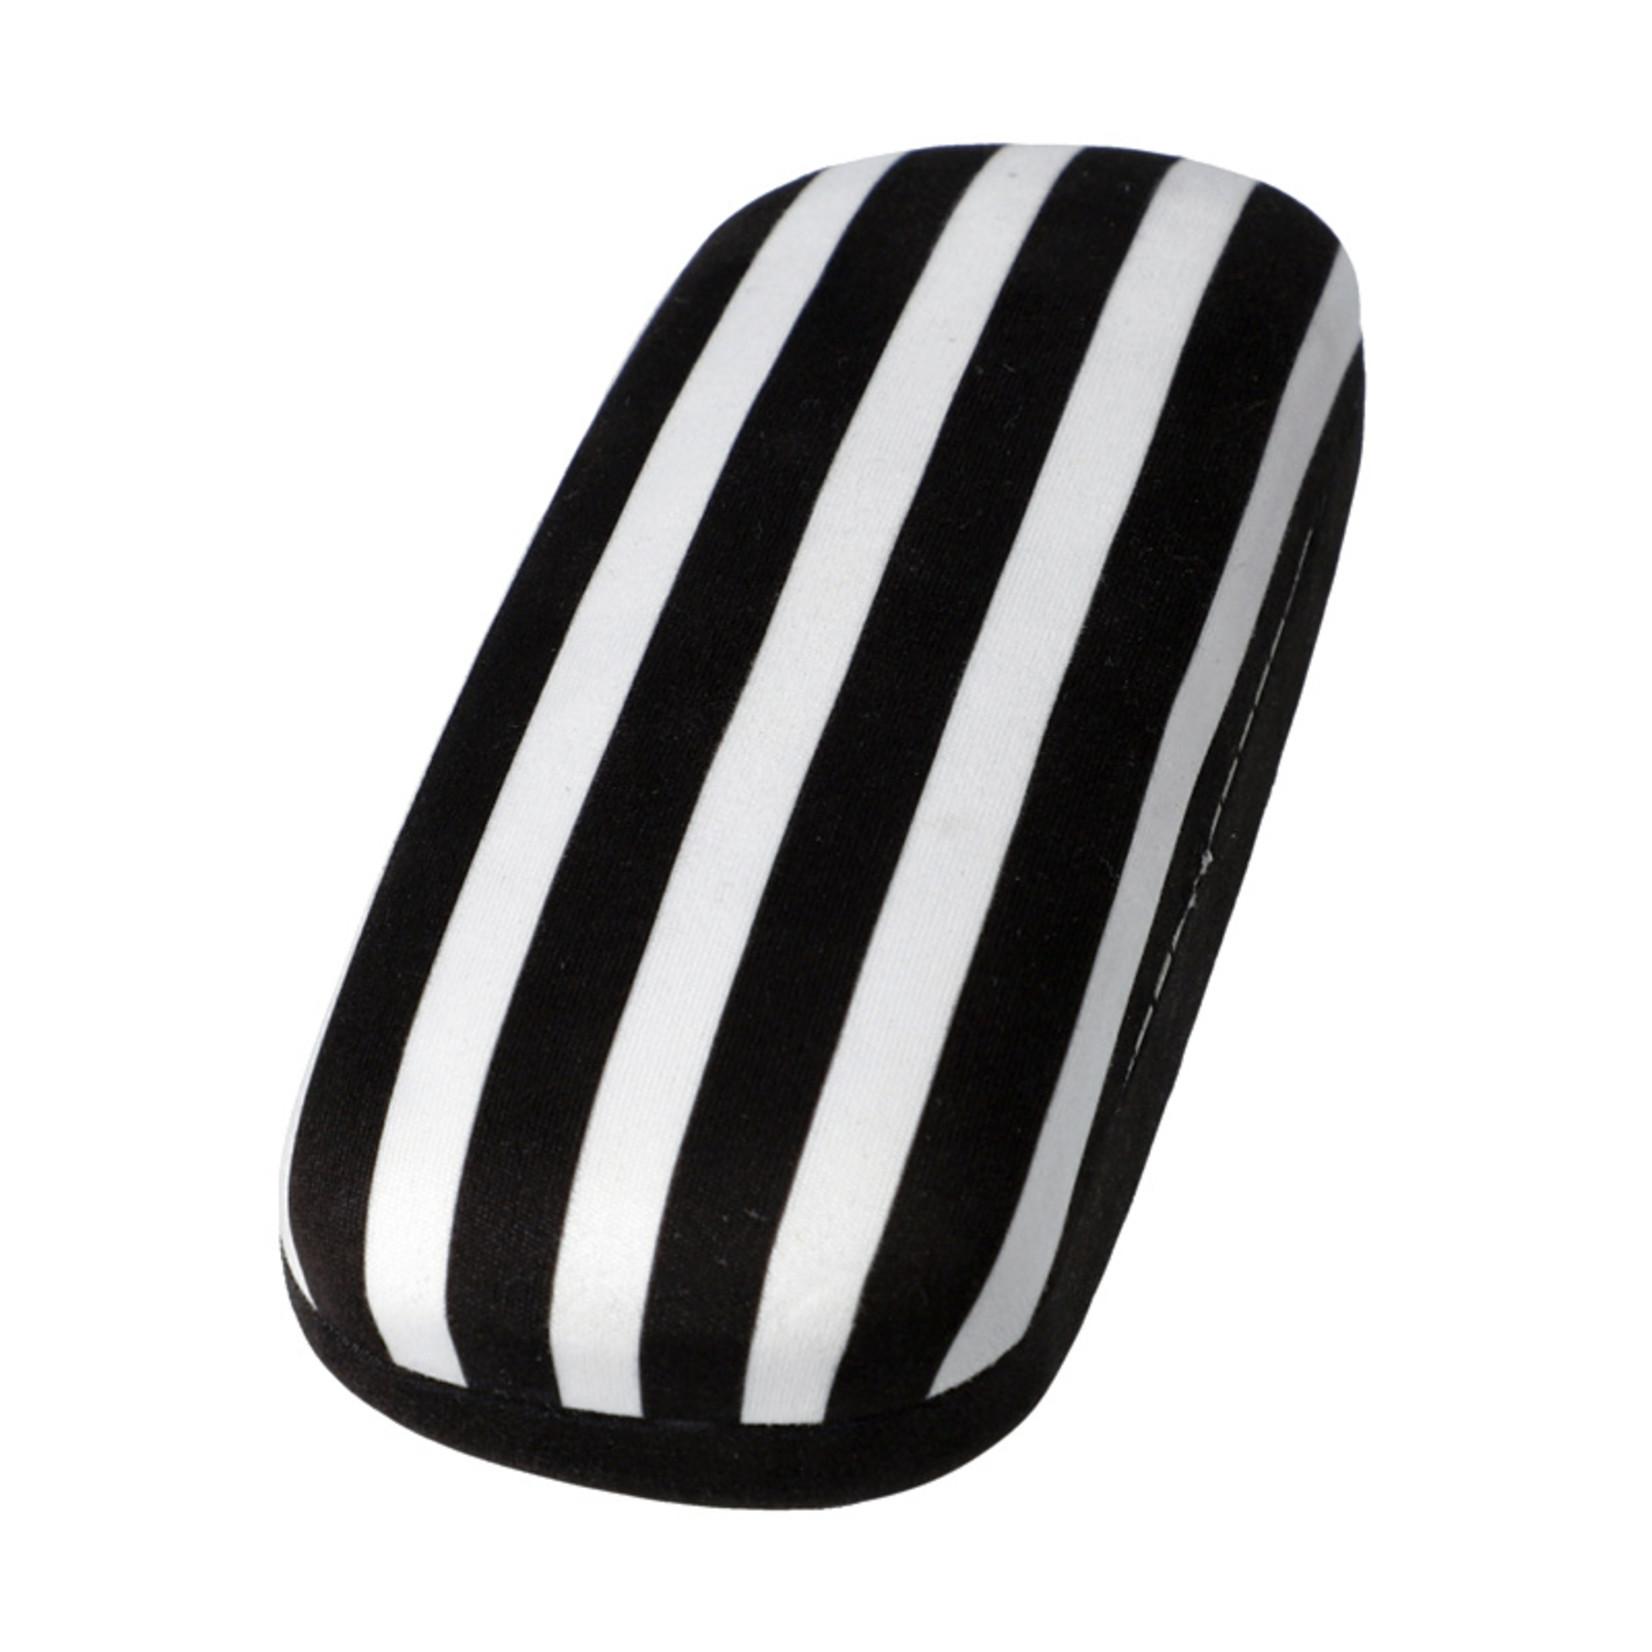 "Goebel Porzellanmanufaktur Brillenetui ""Stripes""   Château   Goebel Accessoires"